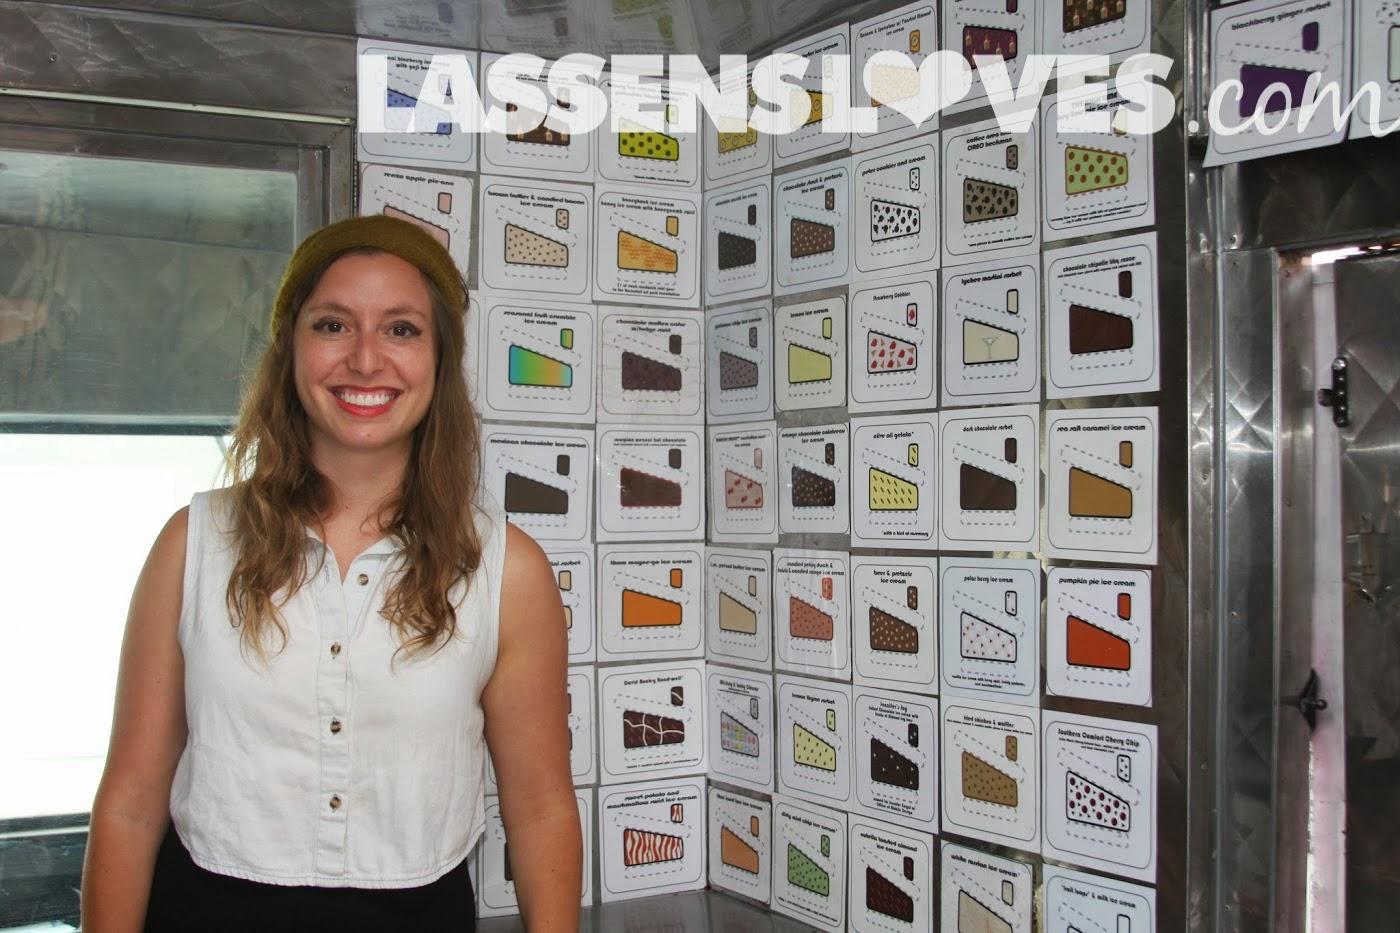 lassensloves.com, Lassen's, Lassens, Coolhaus+Ice+Cream+Sandwiches